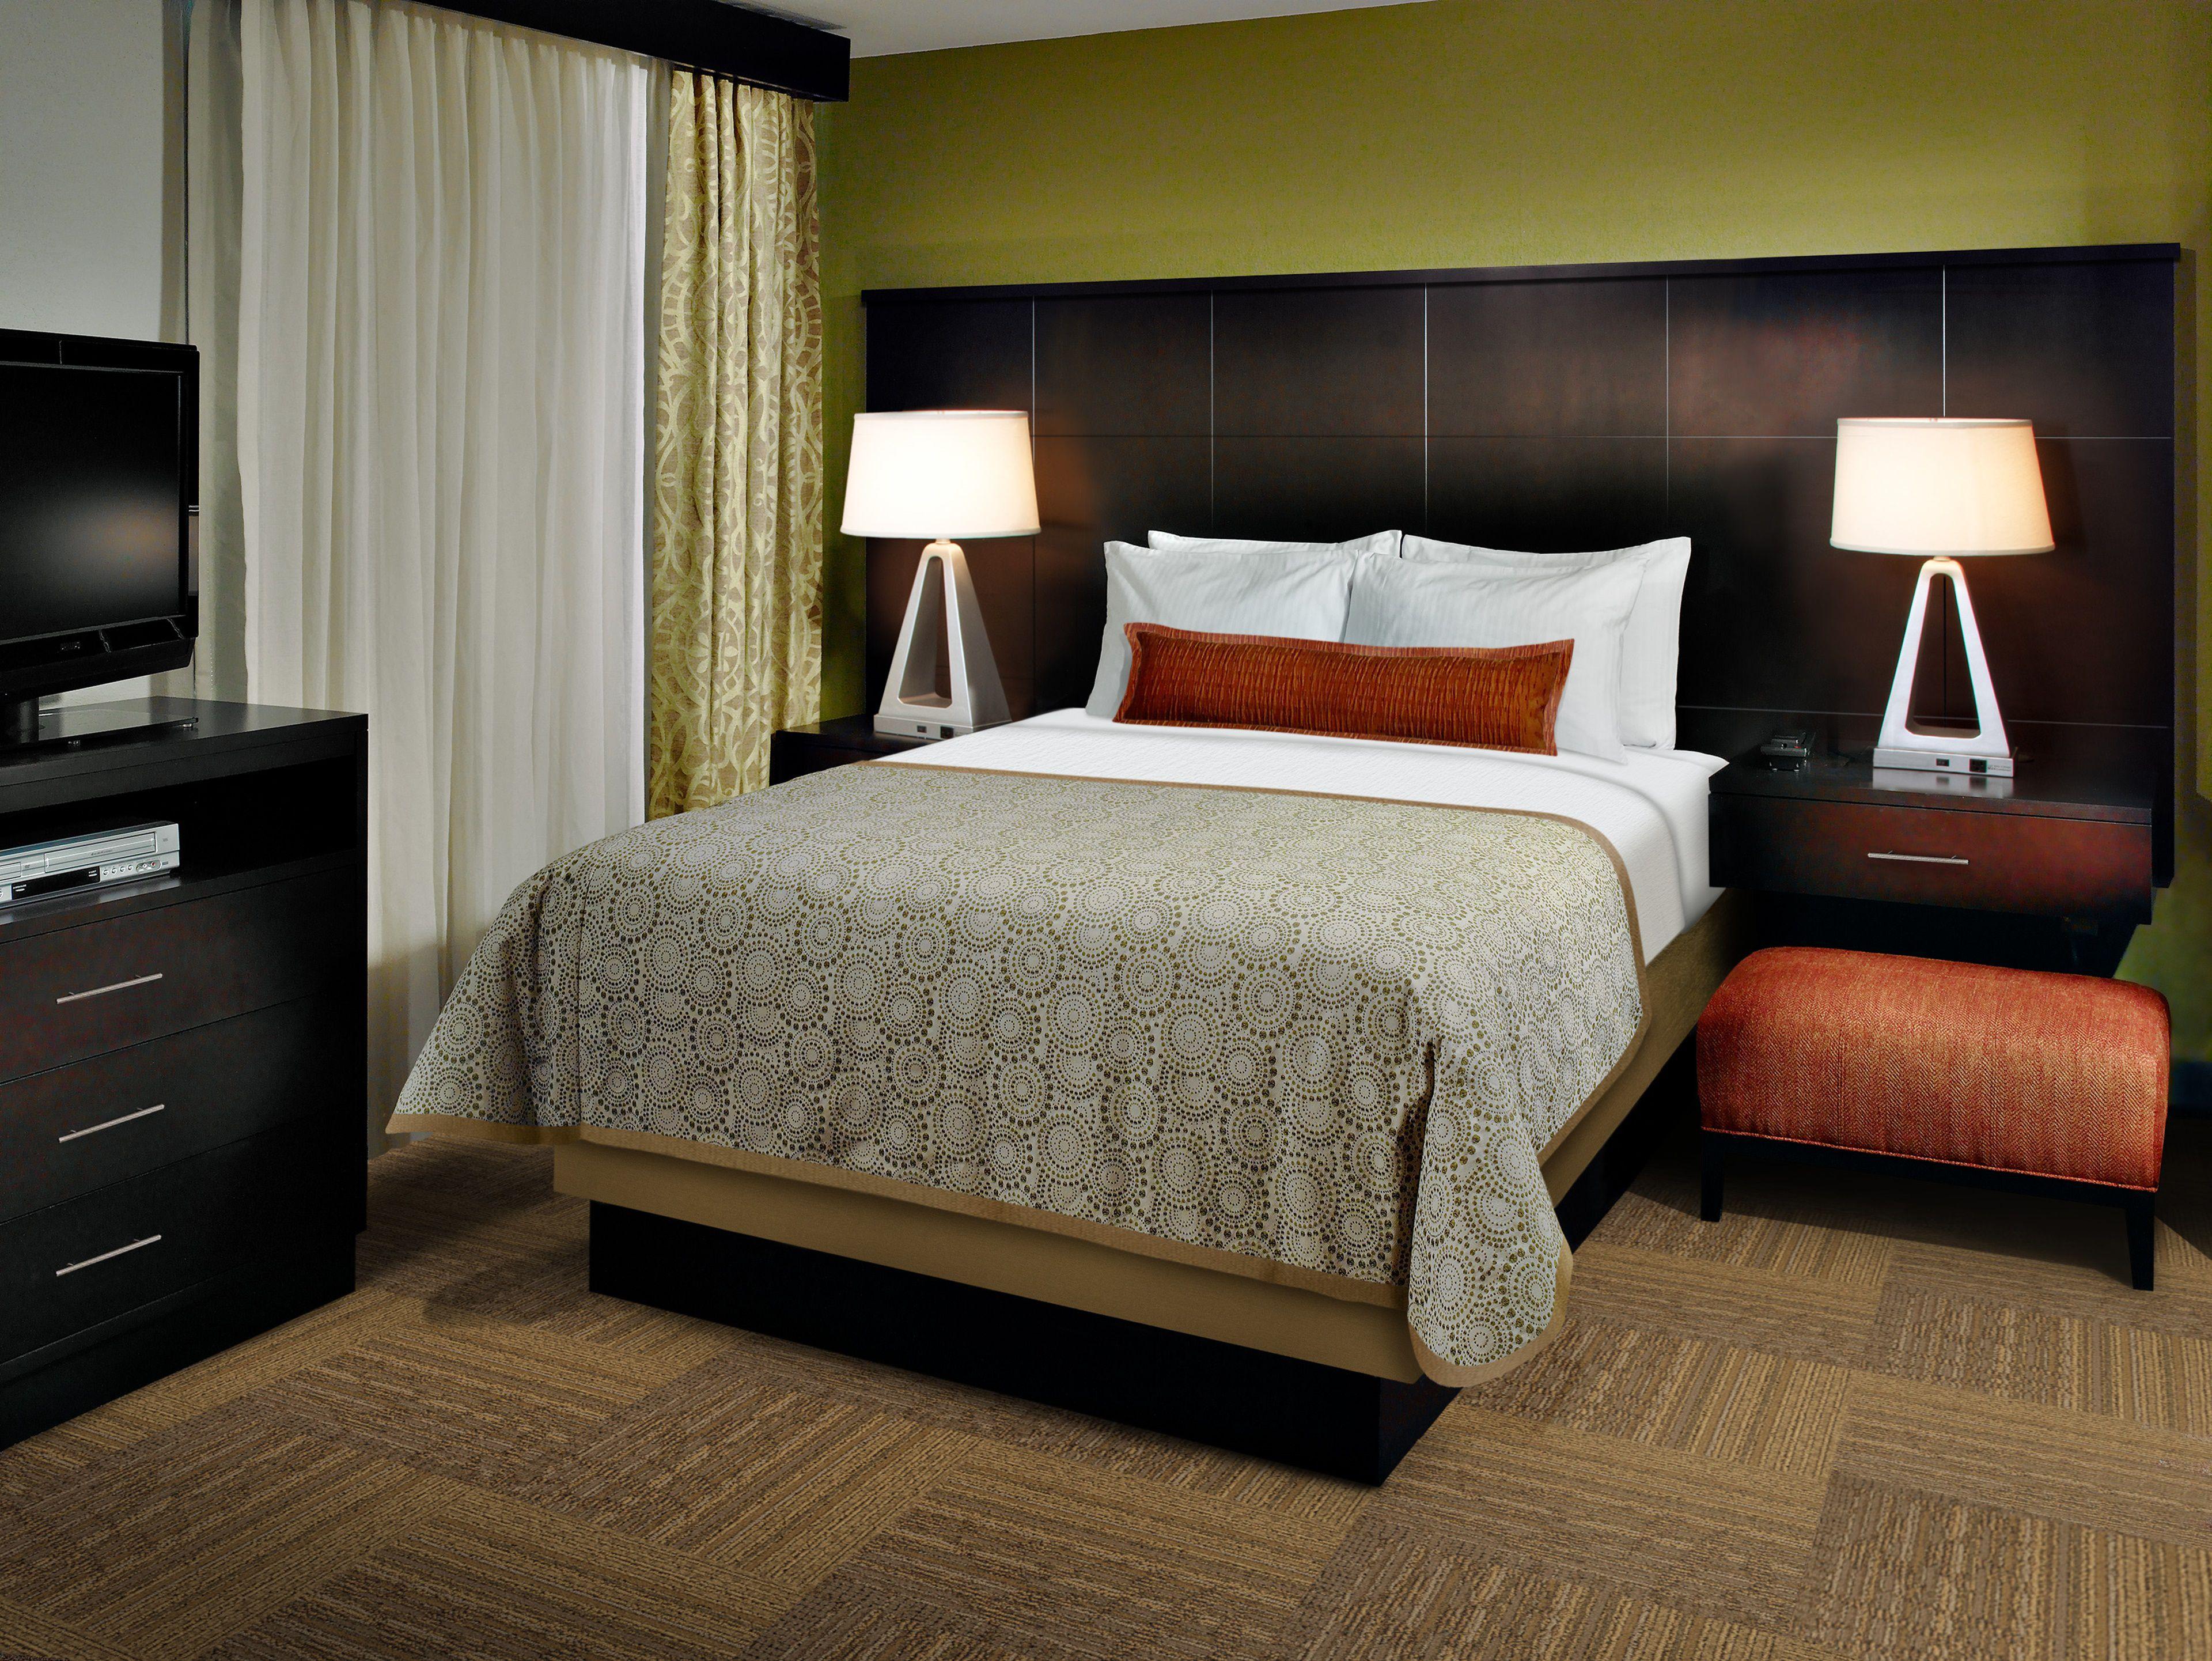 staybridge-suites-denver-4323611734-original.jpg